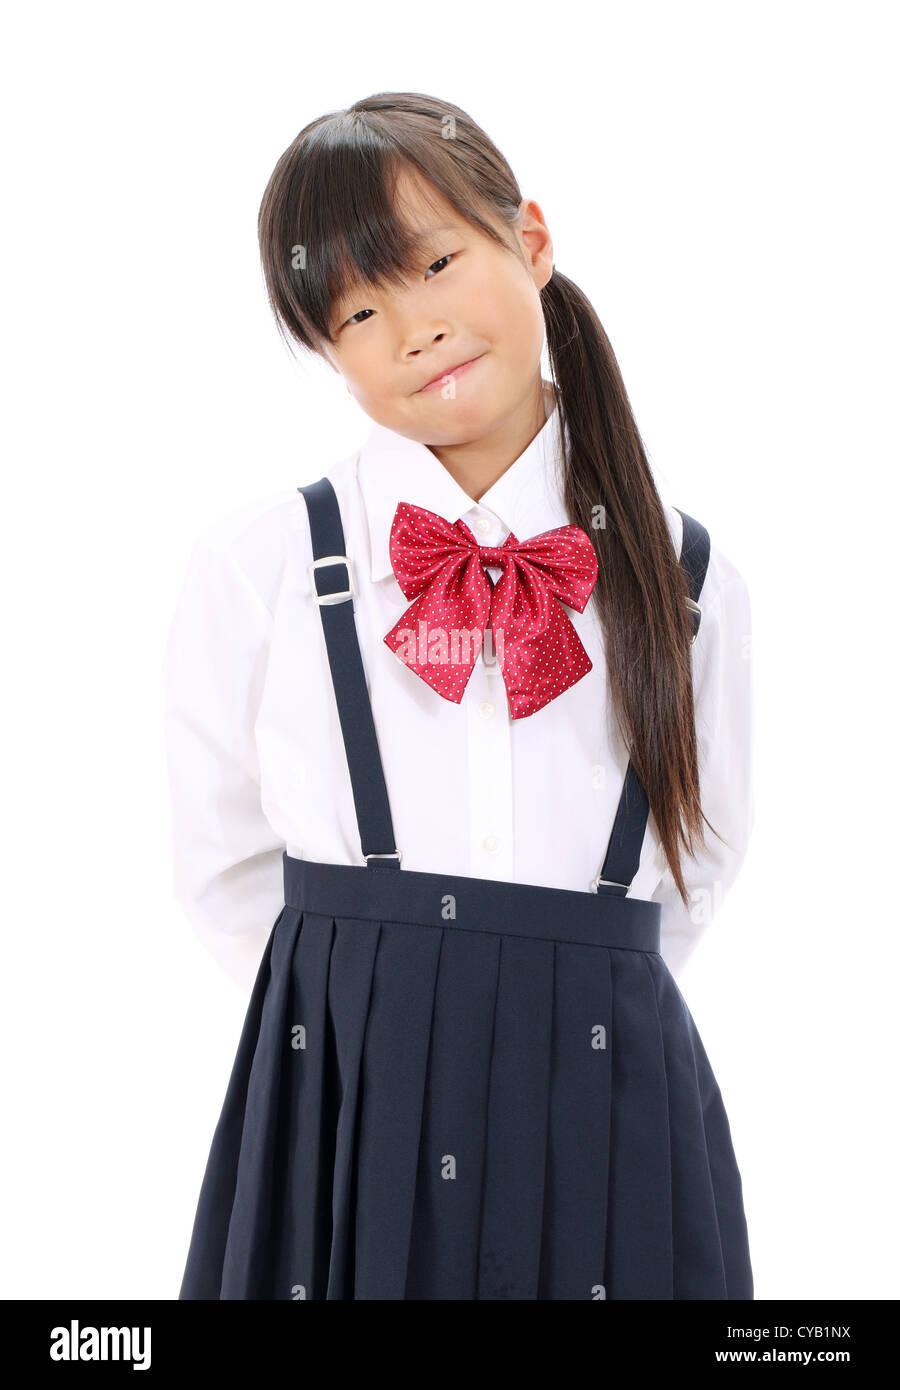 Portrait Of Smiling Little Asian Schoolgirl